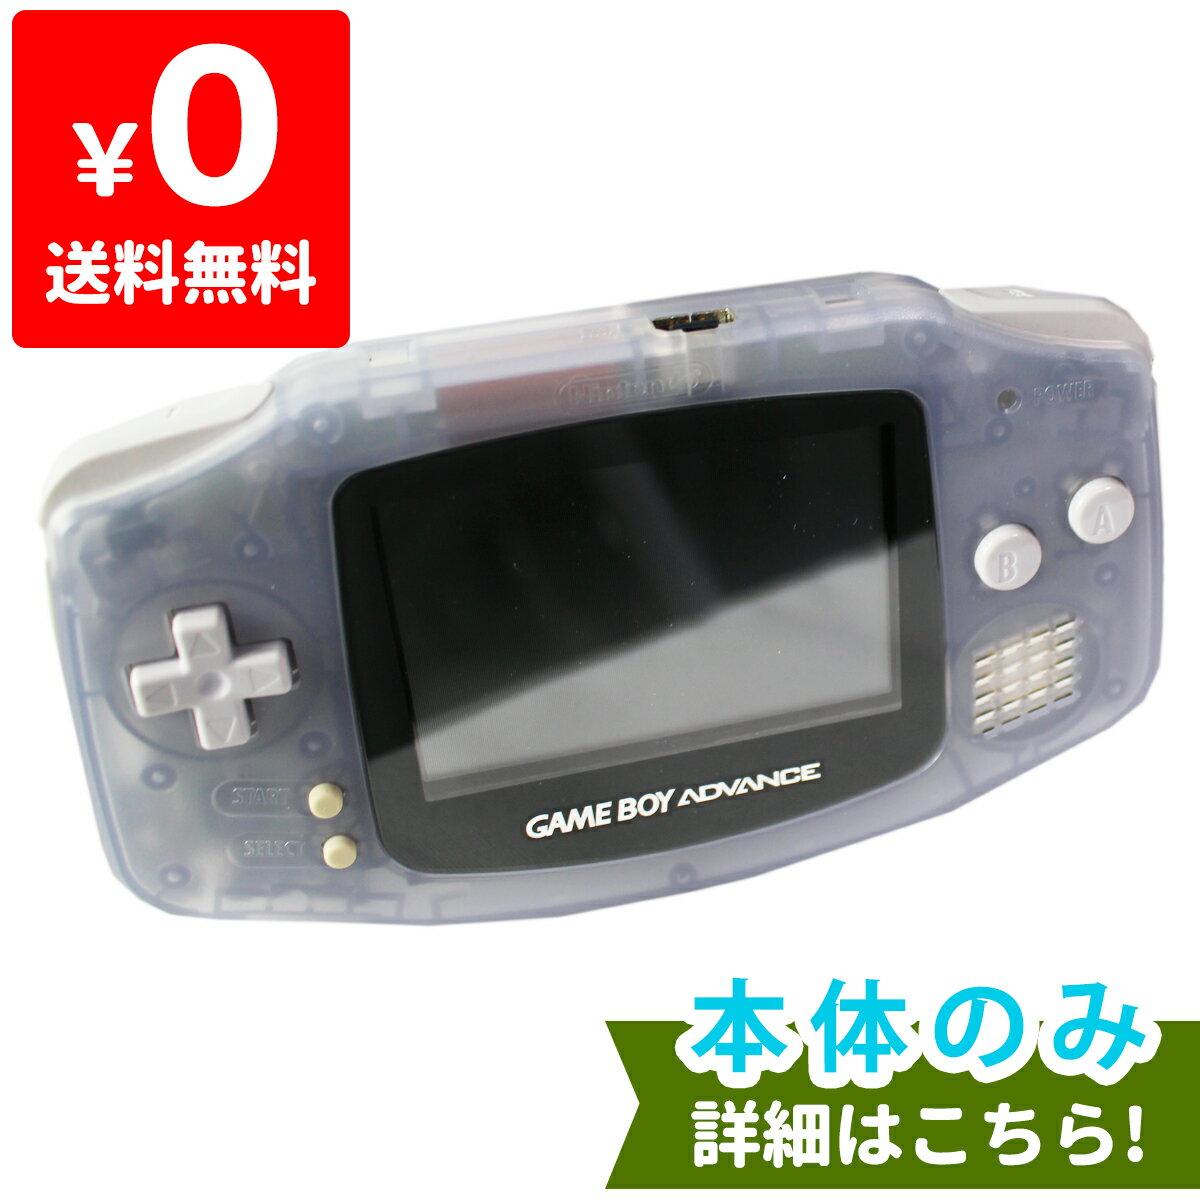 GBA ゲームボーイアドバンス ゲームボーイアドバンス ミルキーブルー 本体のみ 本体単品 Nintendo 任天堂 ニンテンドー 中古 4902370505283 送料無料 【中古】